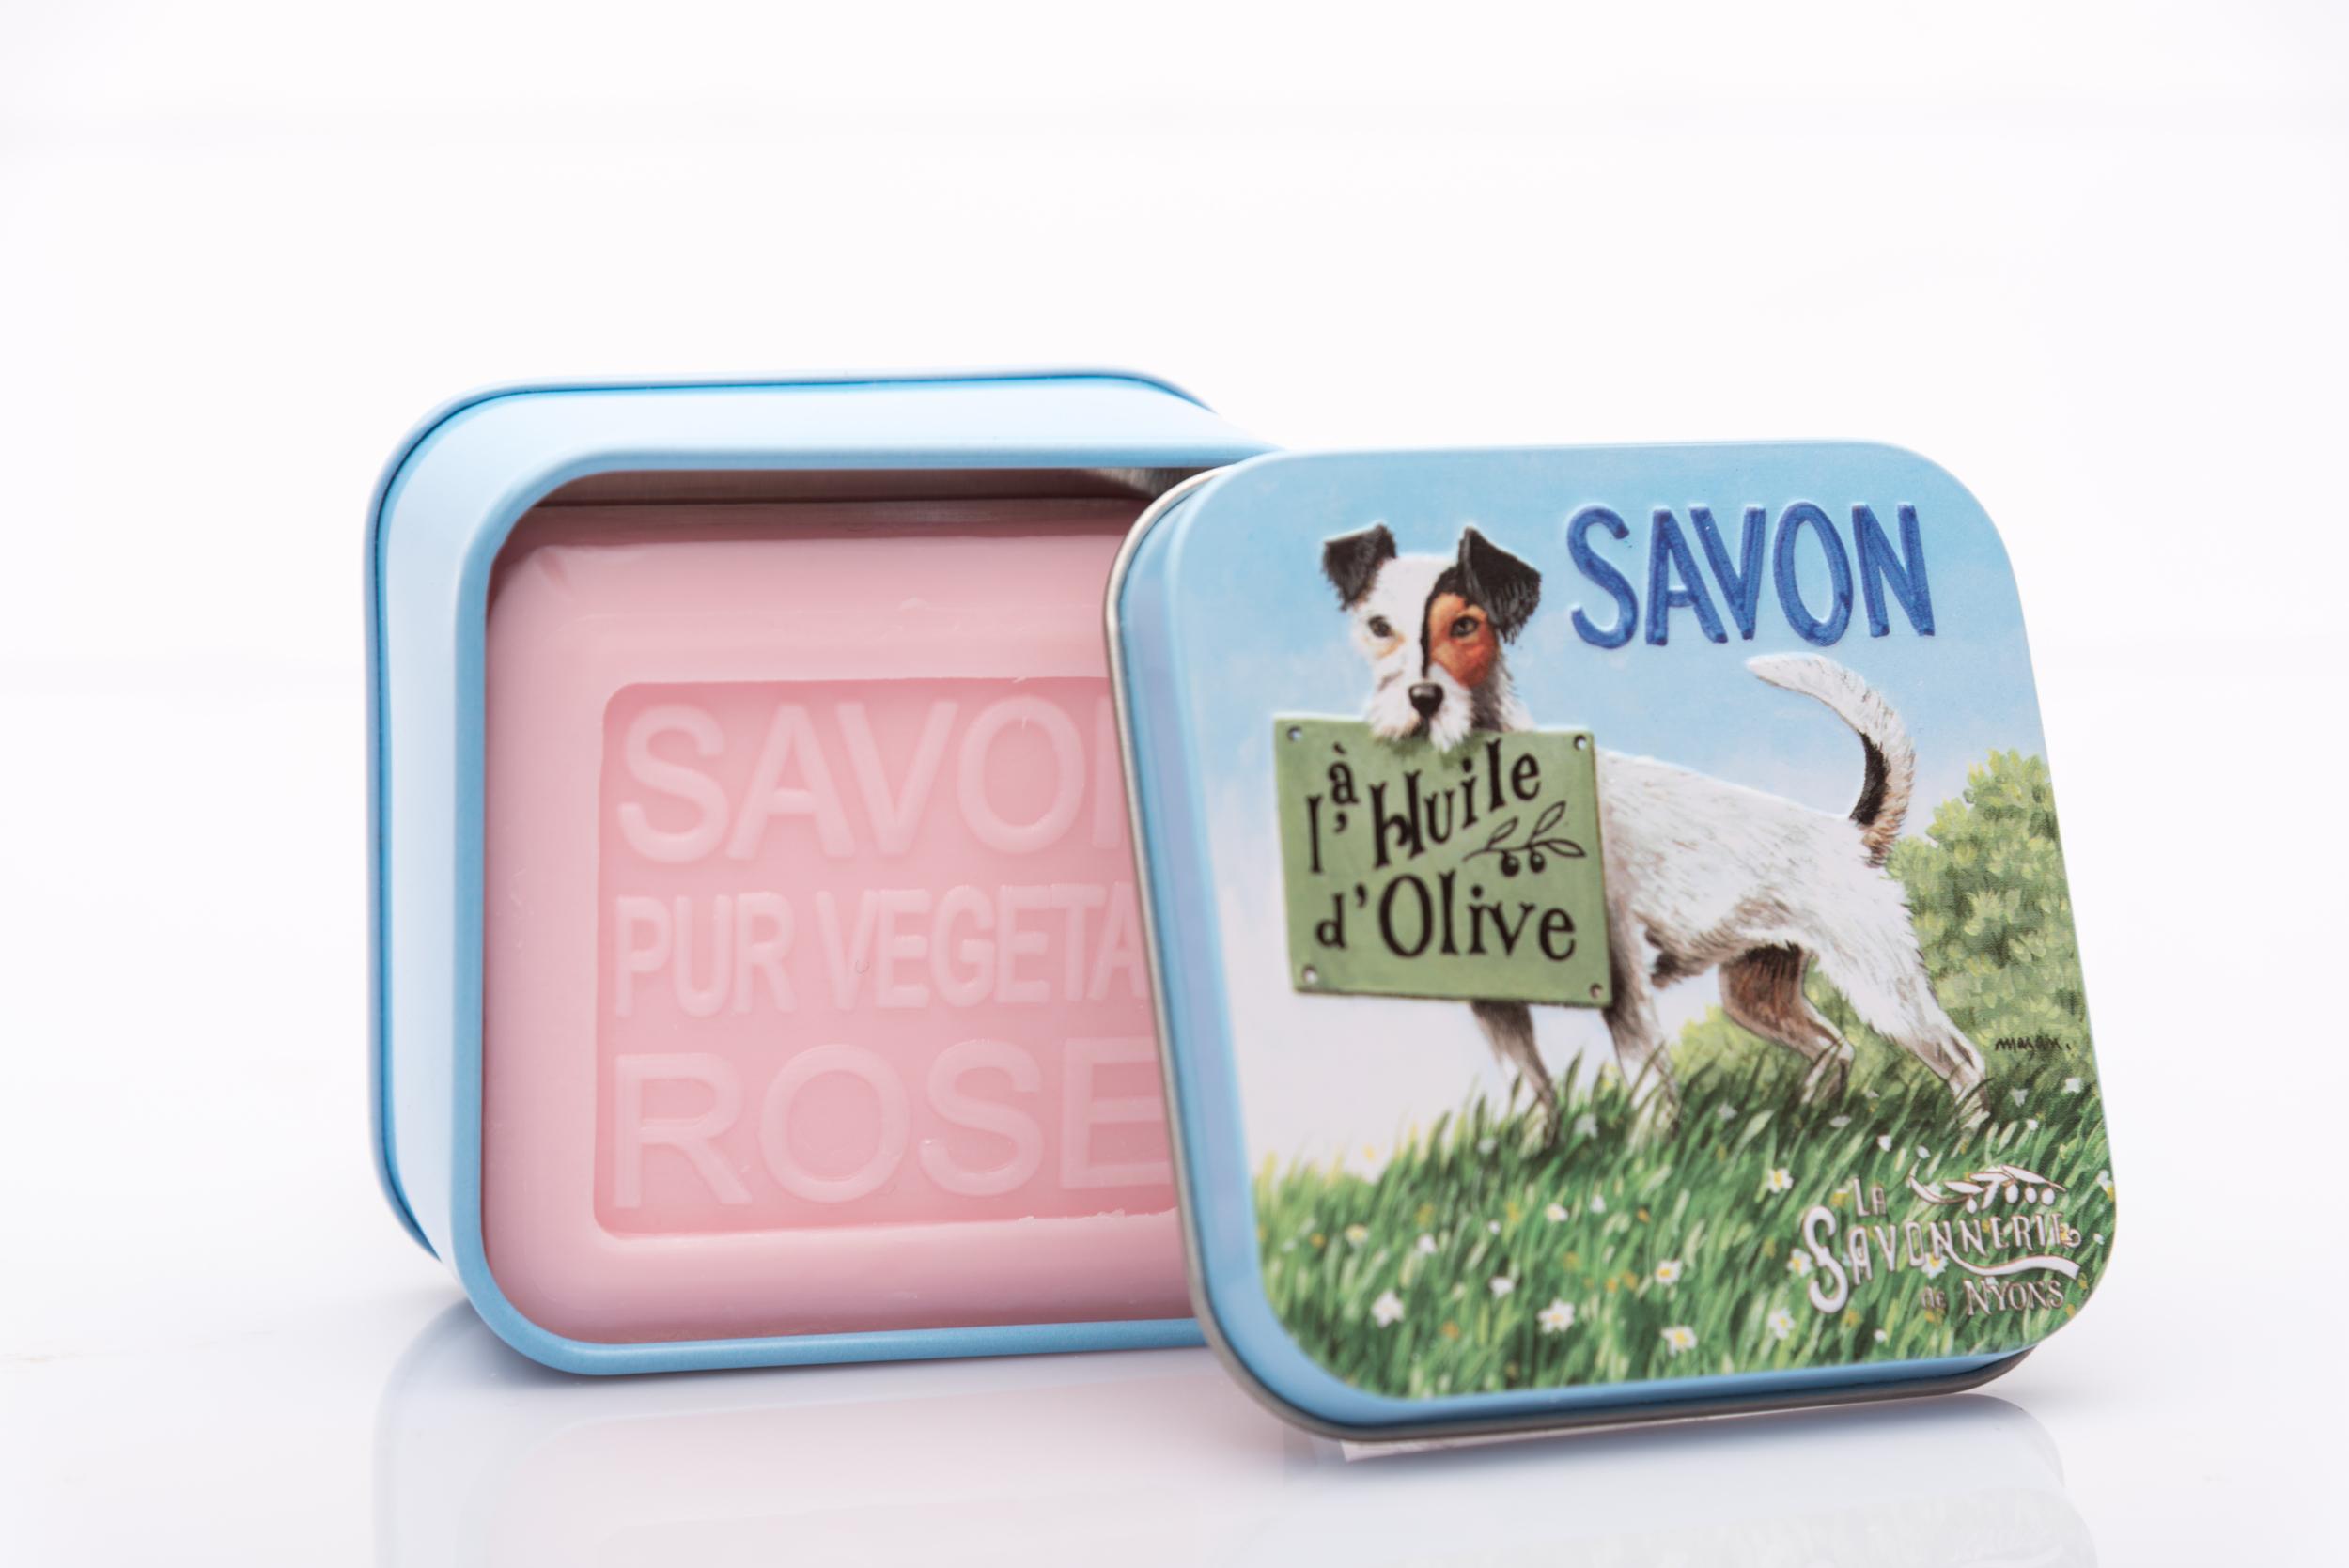 SAVON DE NYONS VEGETAL MADE IN FRANCE AVEC BOITE METALIQUE MODELE 6 A LA ROSE